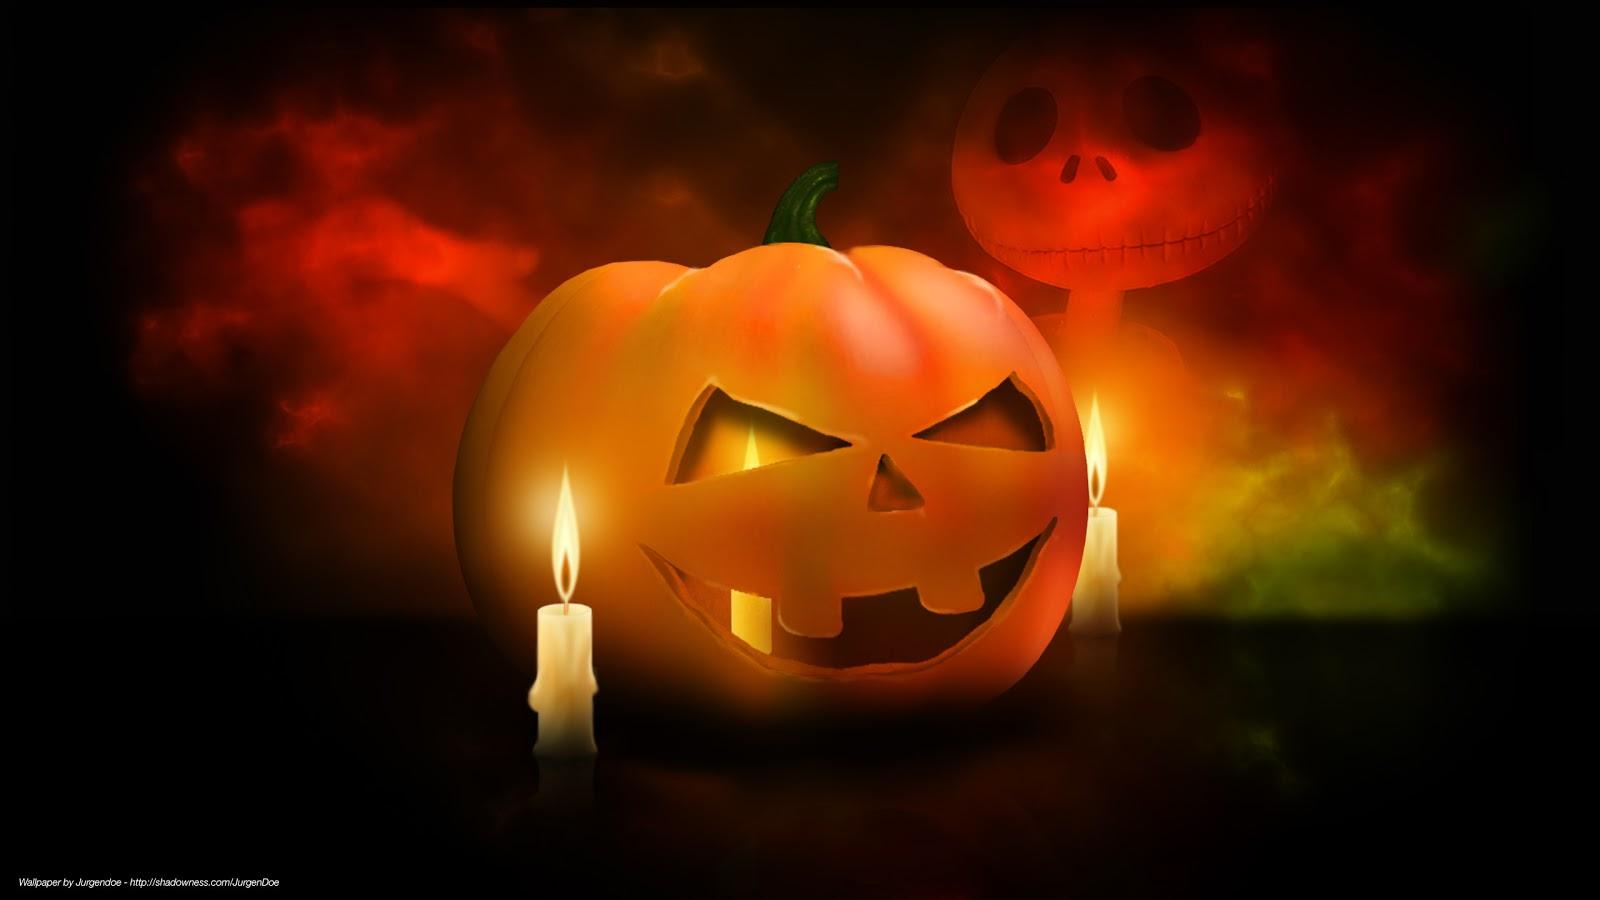 http://4.bp.blogspot.com/-6-jiItVNIC0/UHbqH4ZDKNI/AAAAAAAAHRQ/q52dQ2NJUPw/s1600/Halloween+Wallpaper+009.jpg